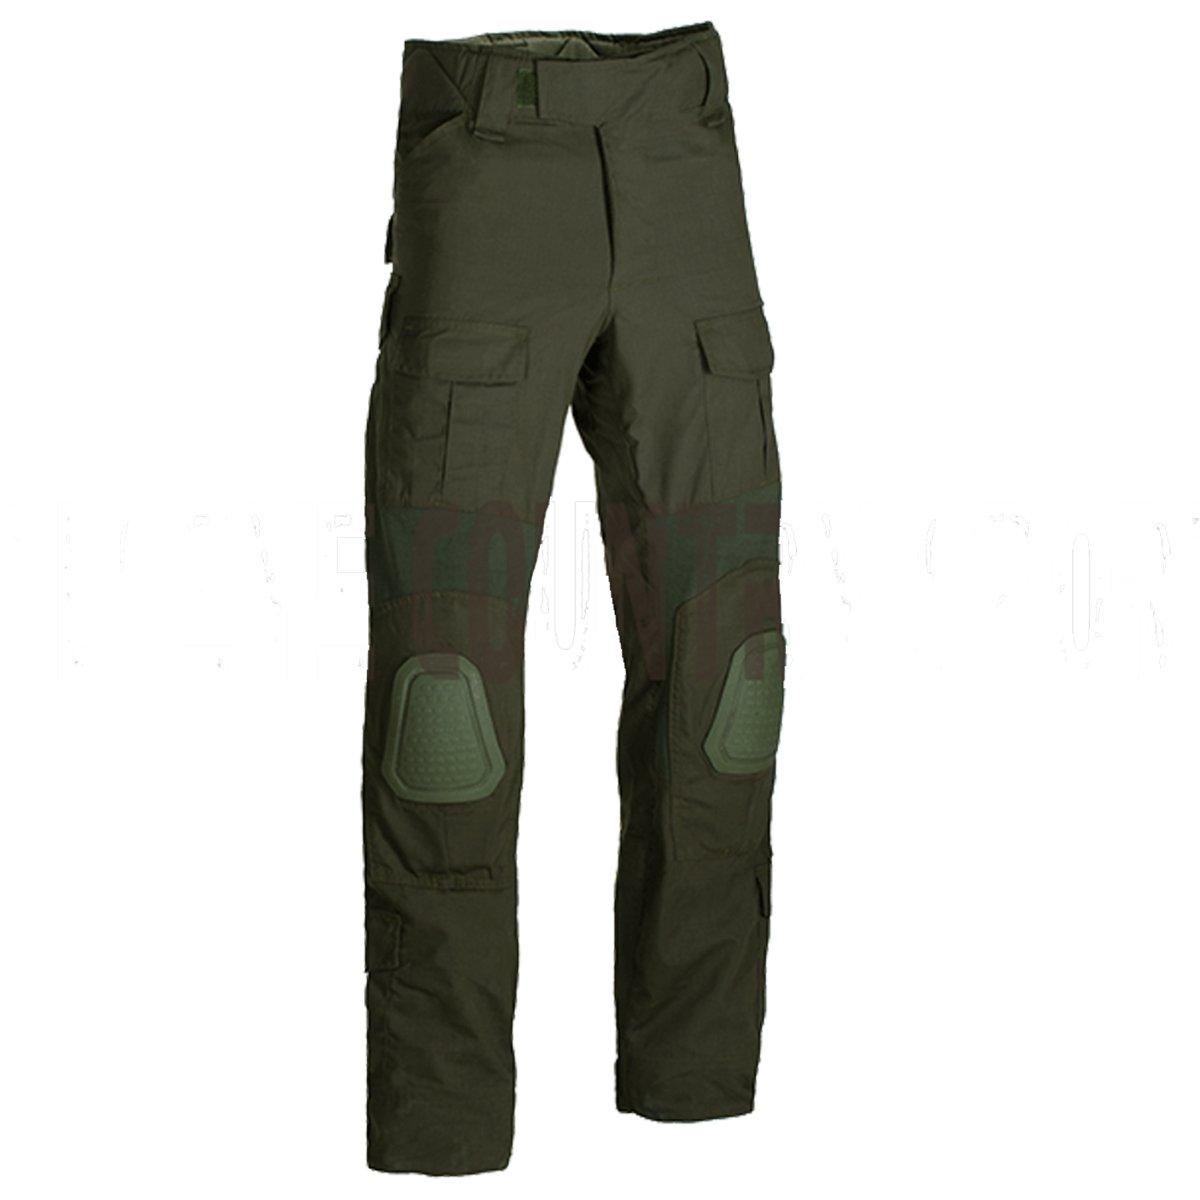 Invader Gear Protator Pants Trousers Grün